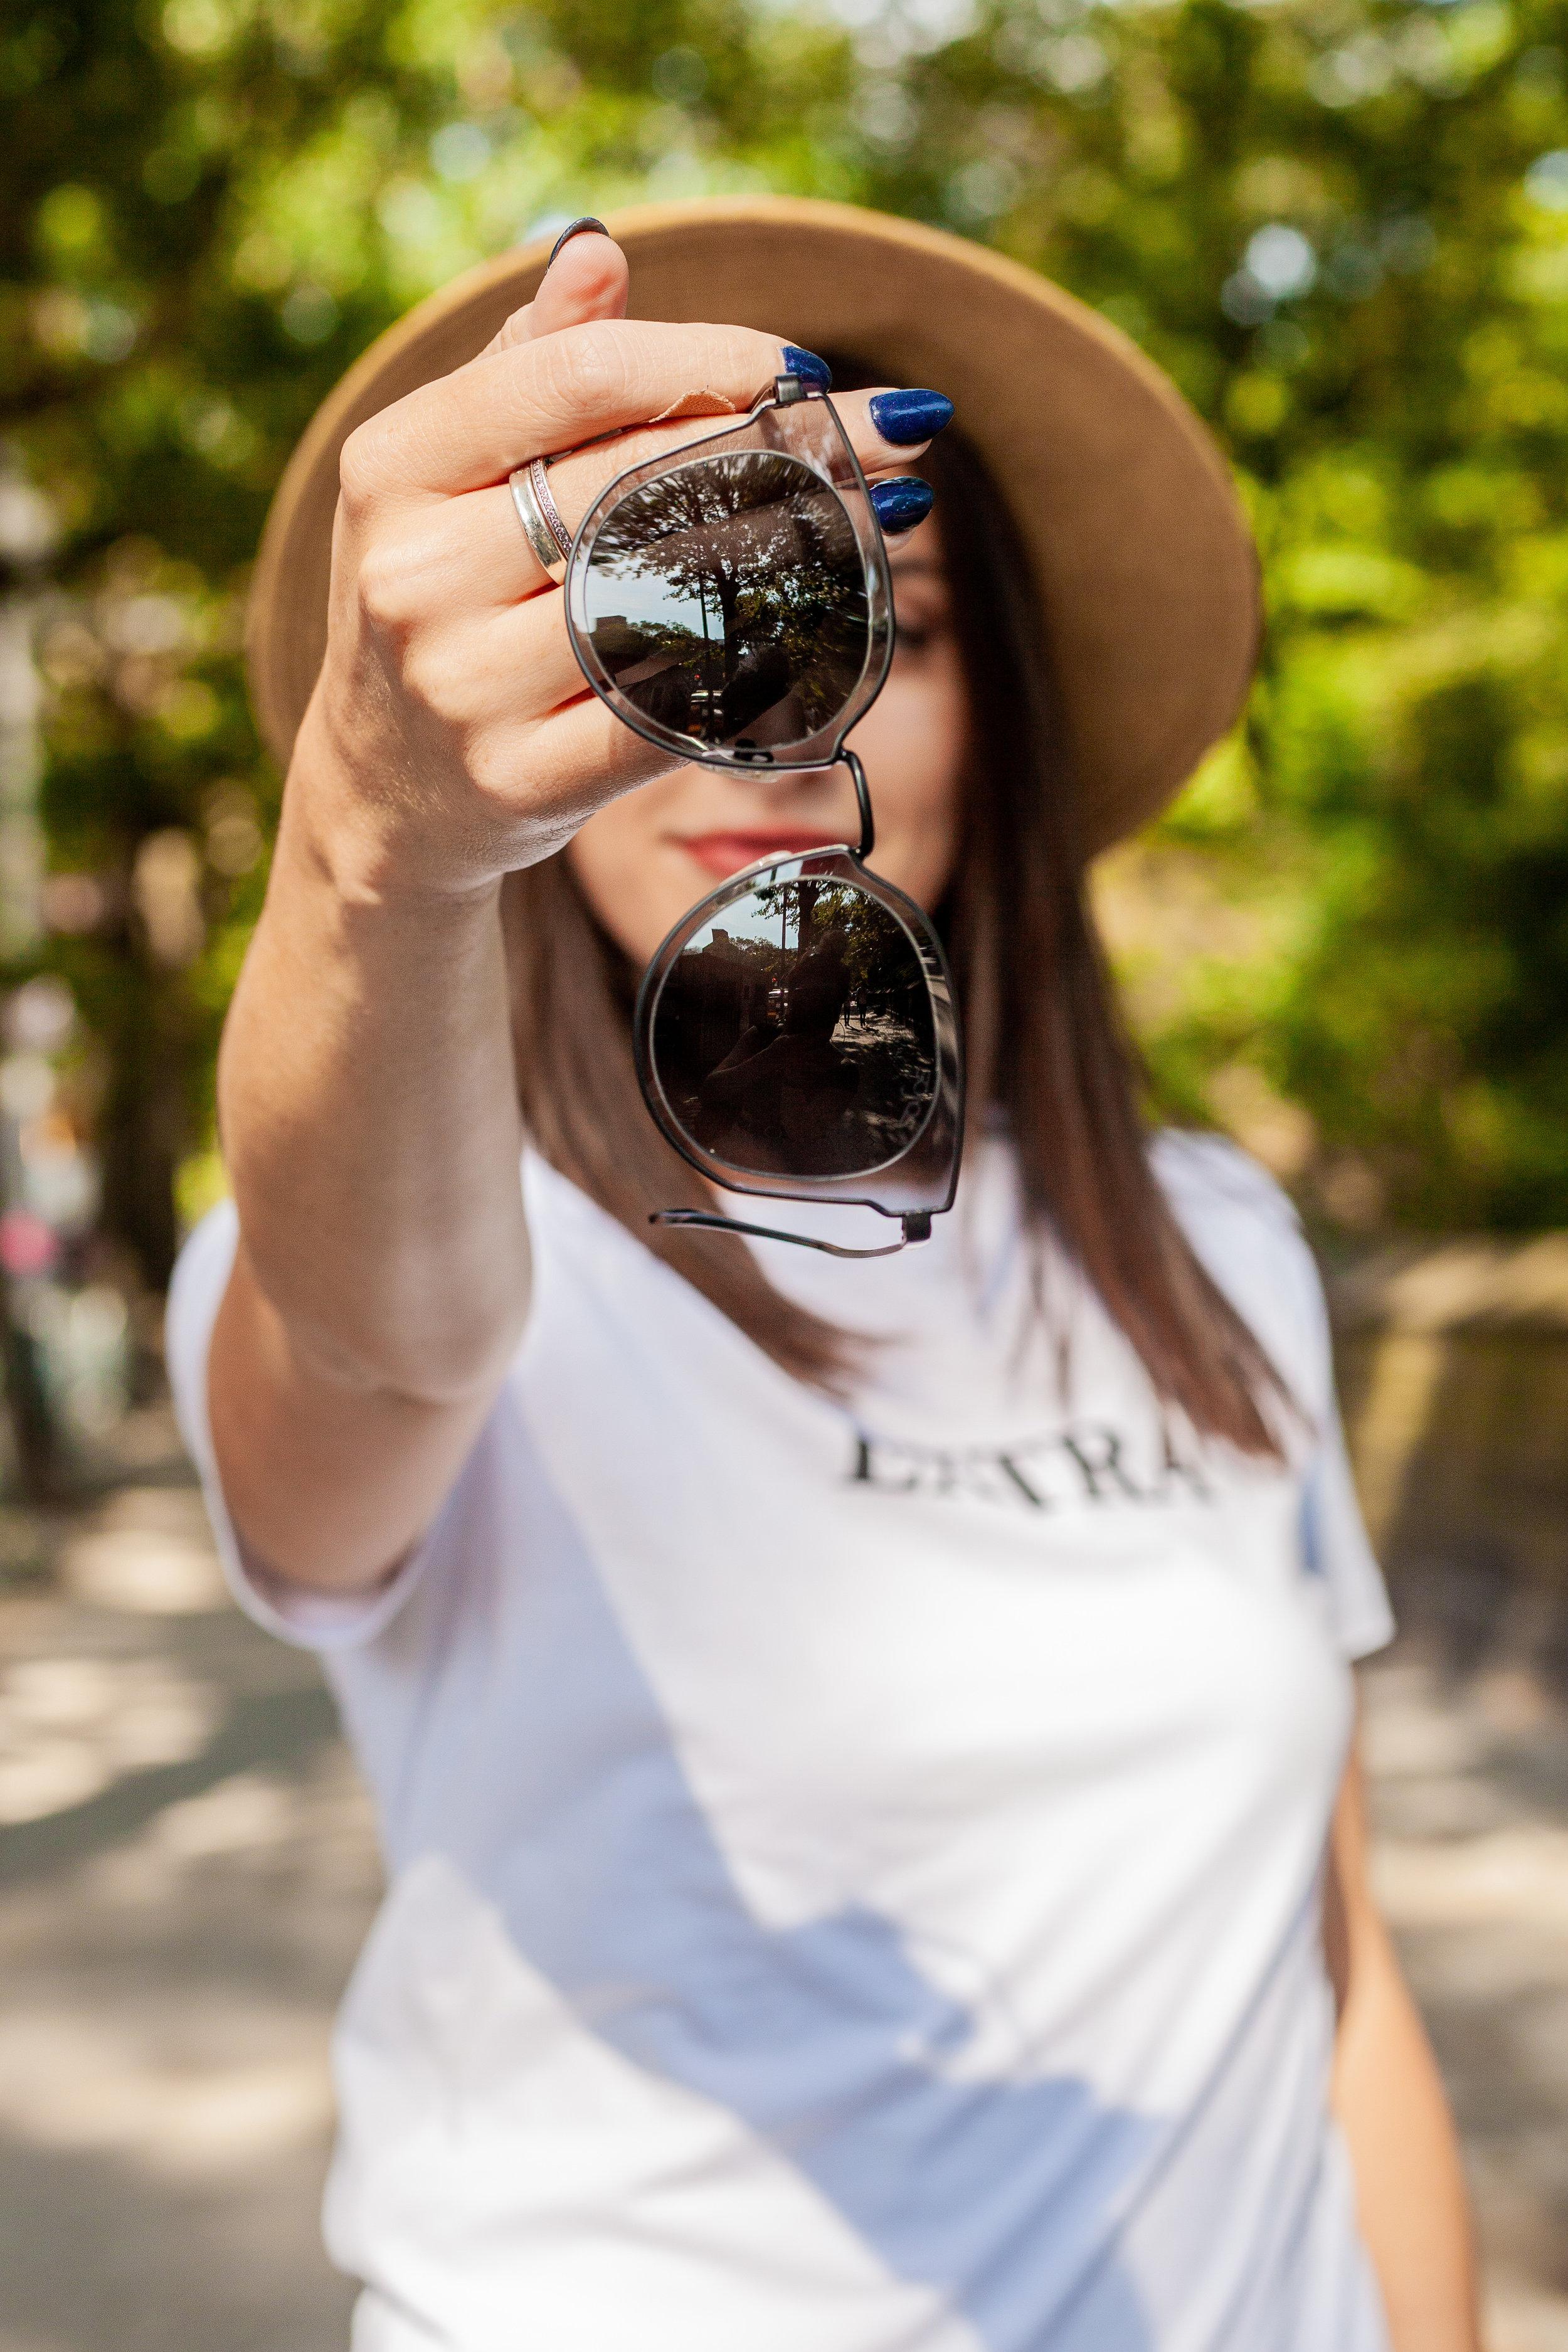 SOJOS Fashion Polarized  Sunglasses  for Women UV400 Mirrored Lens SJ1057 with Black Frame/Grey Lens